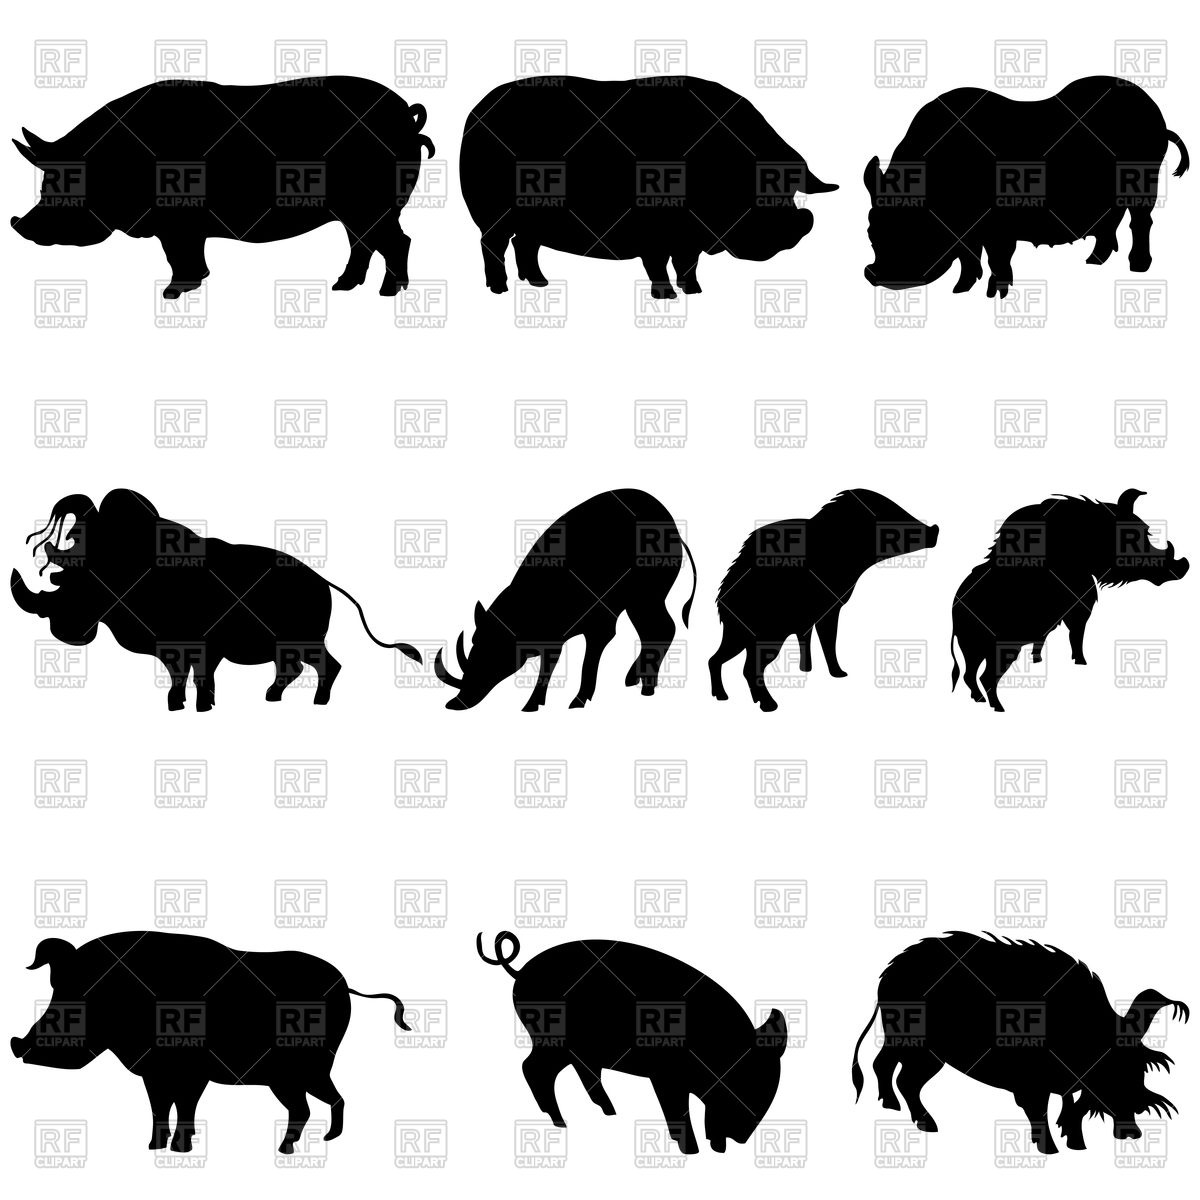 Cartoon fat pig Vector Image #8204.